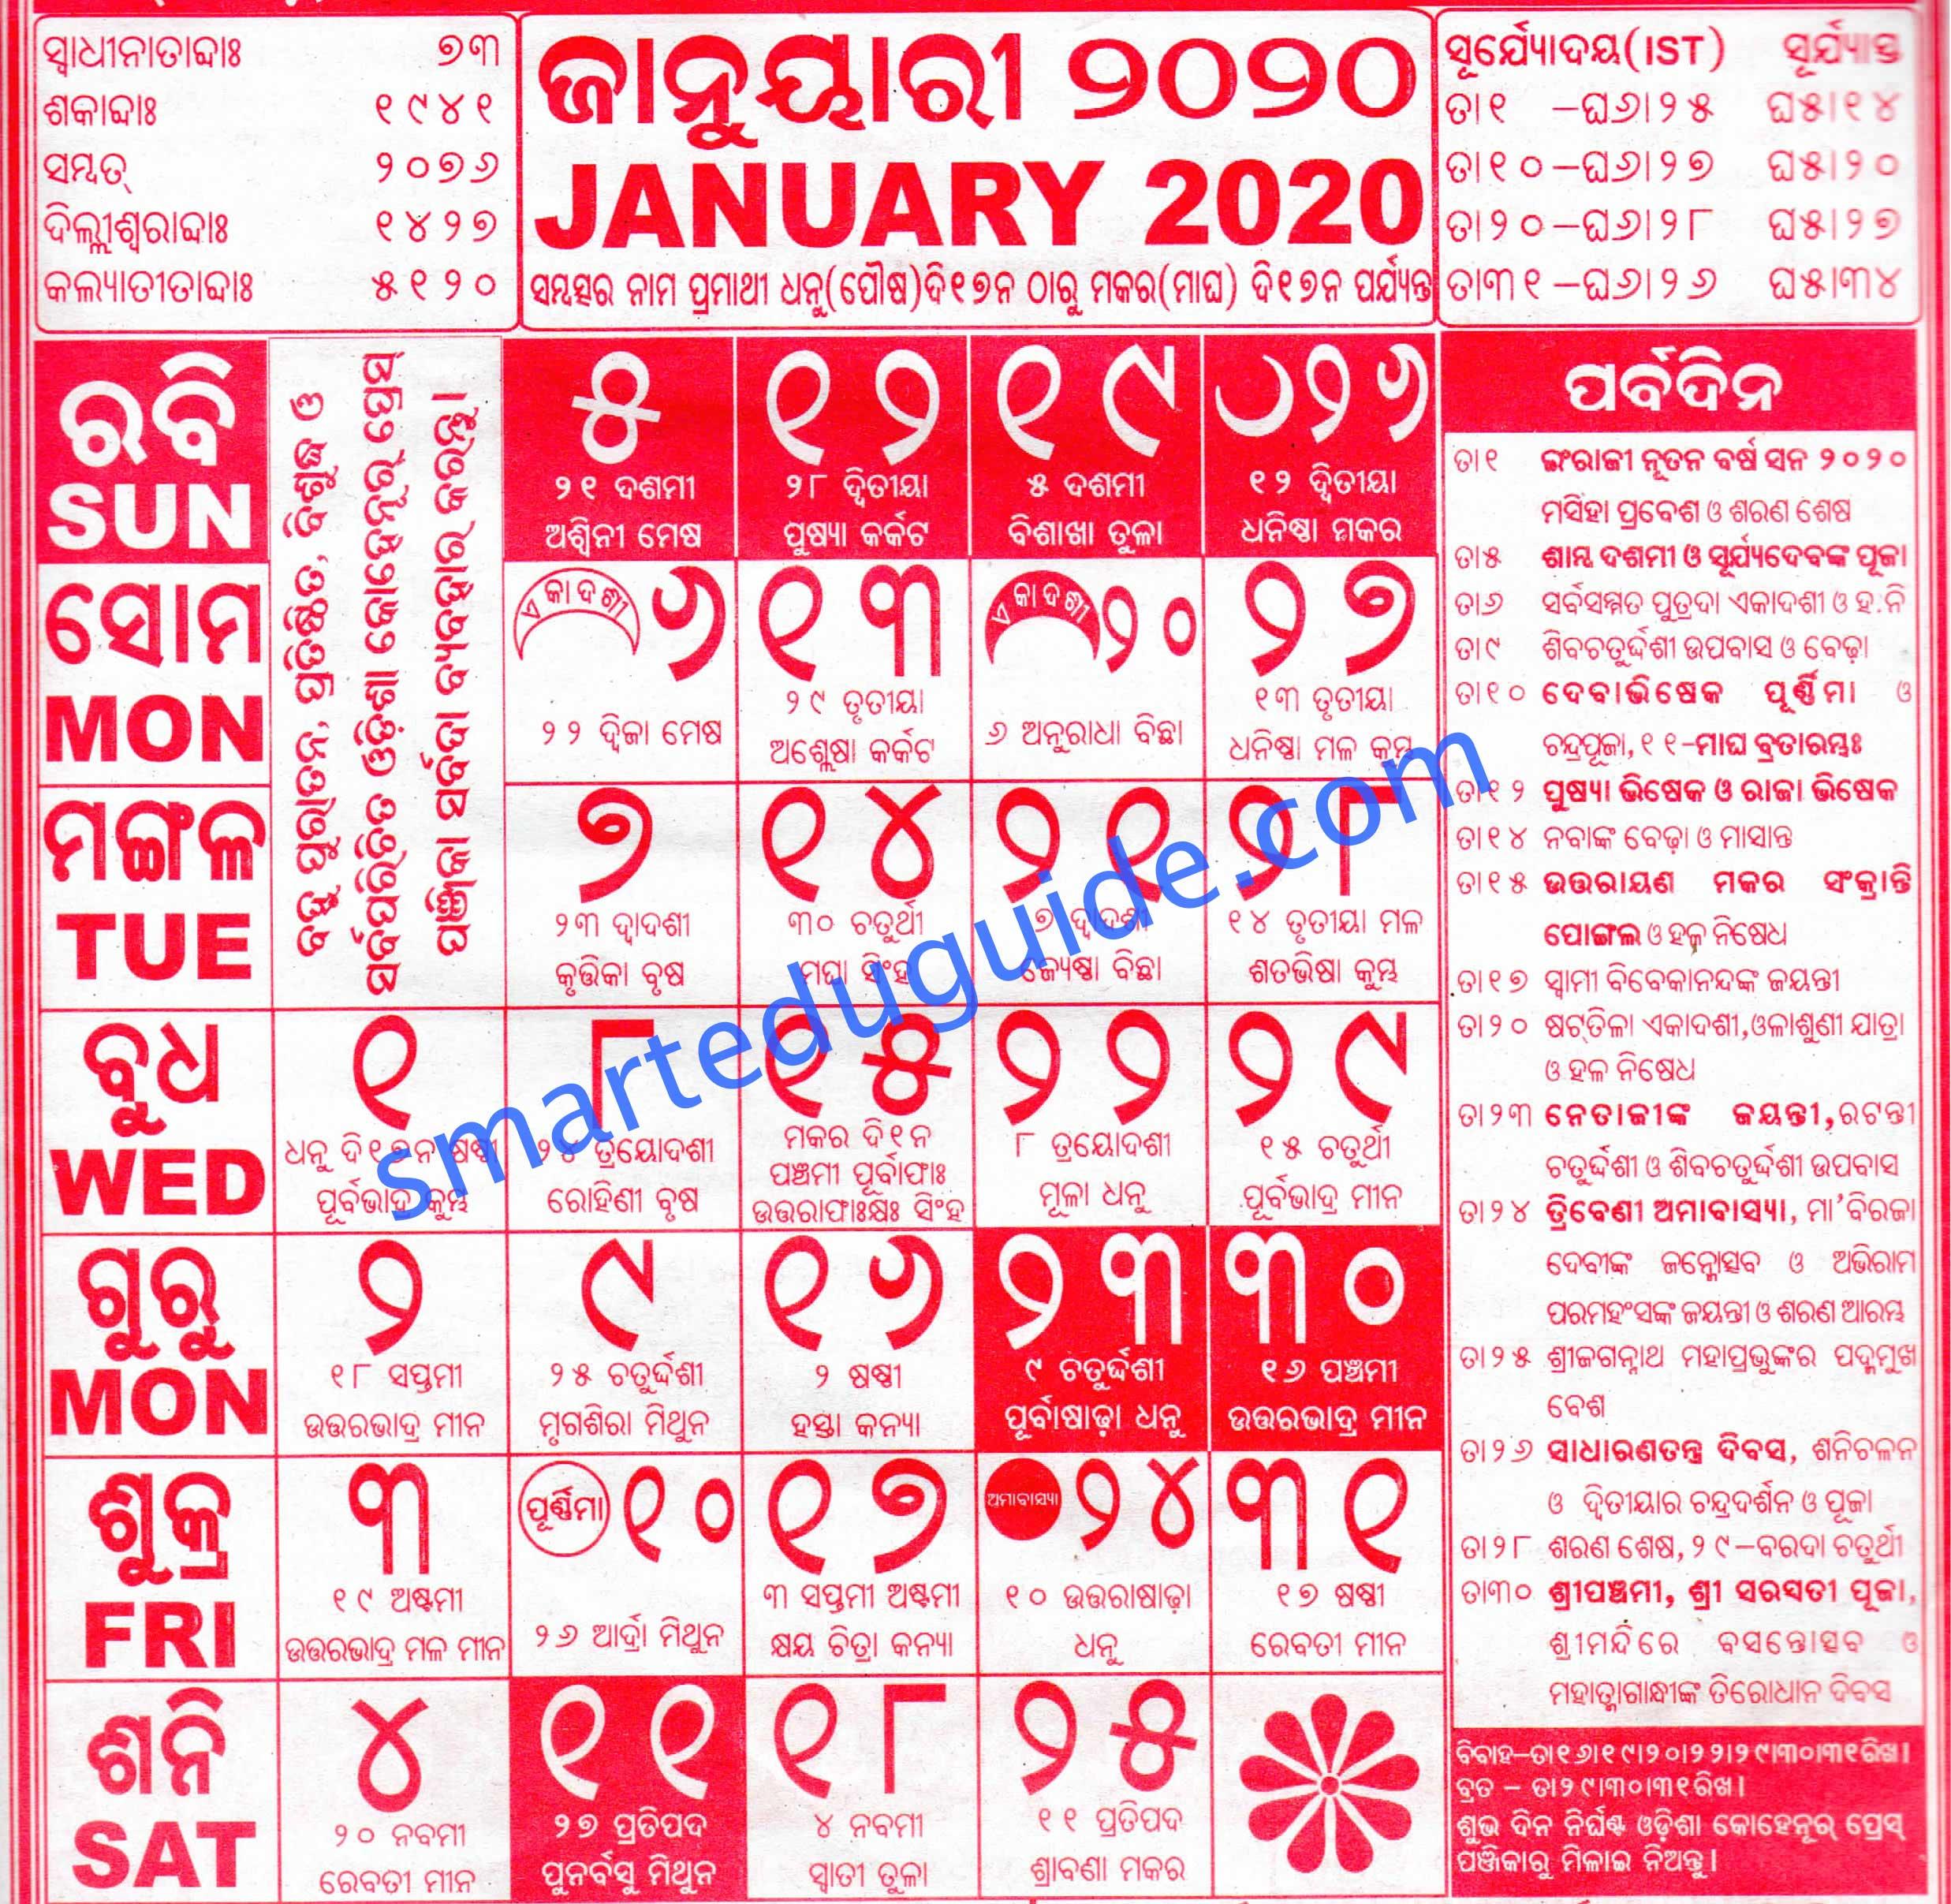 Odia Calendar 2020 Kohinoor Pdf | Seg for Odia Calendar January 2020